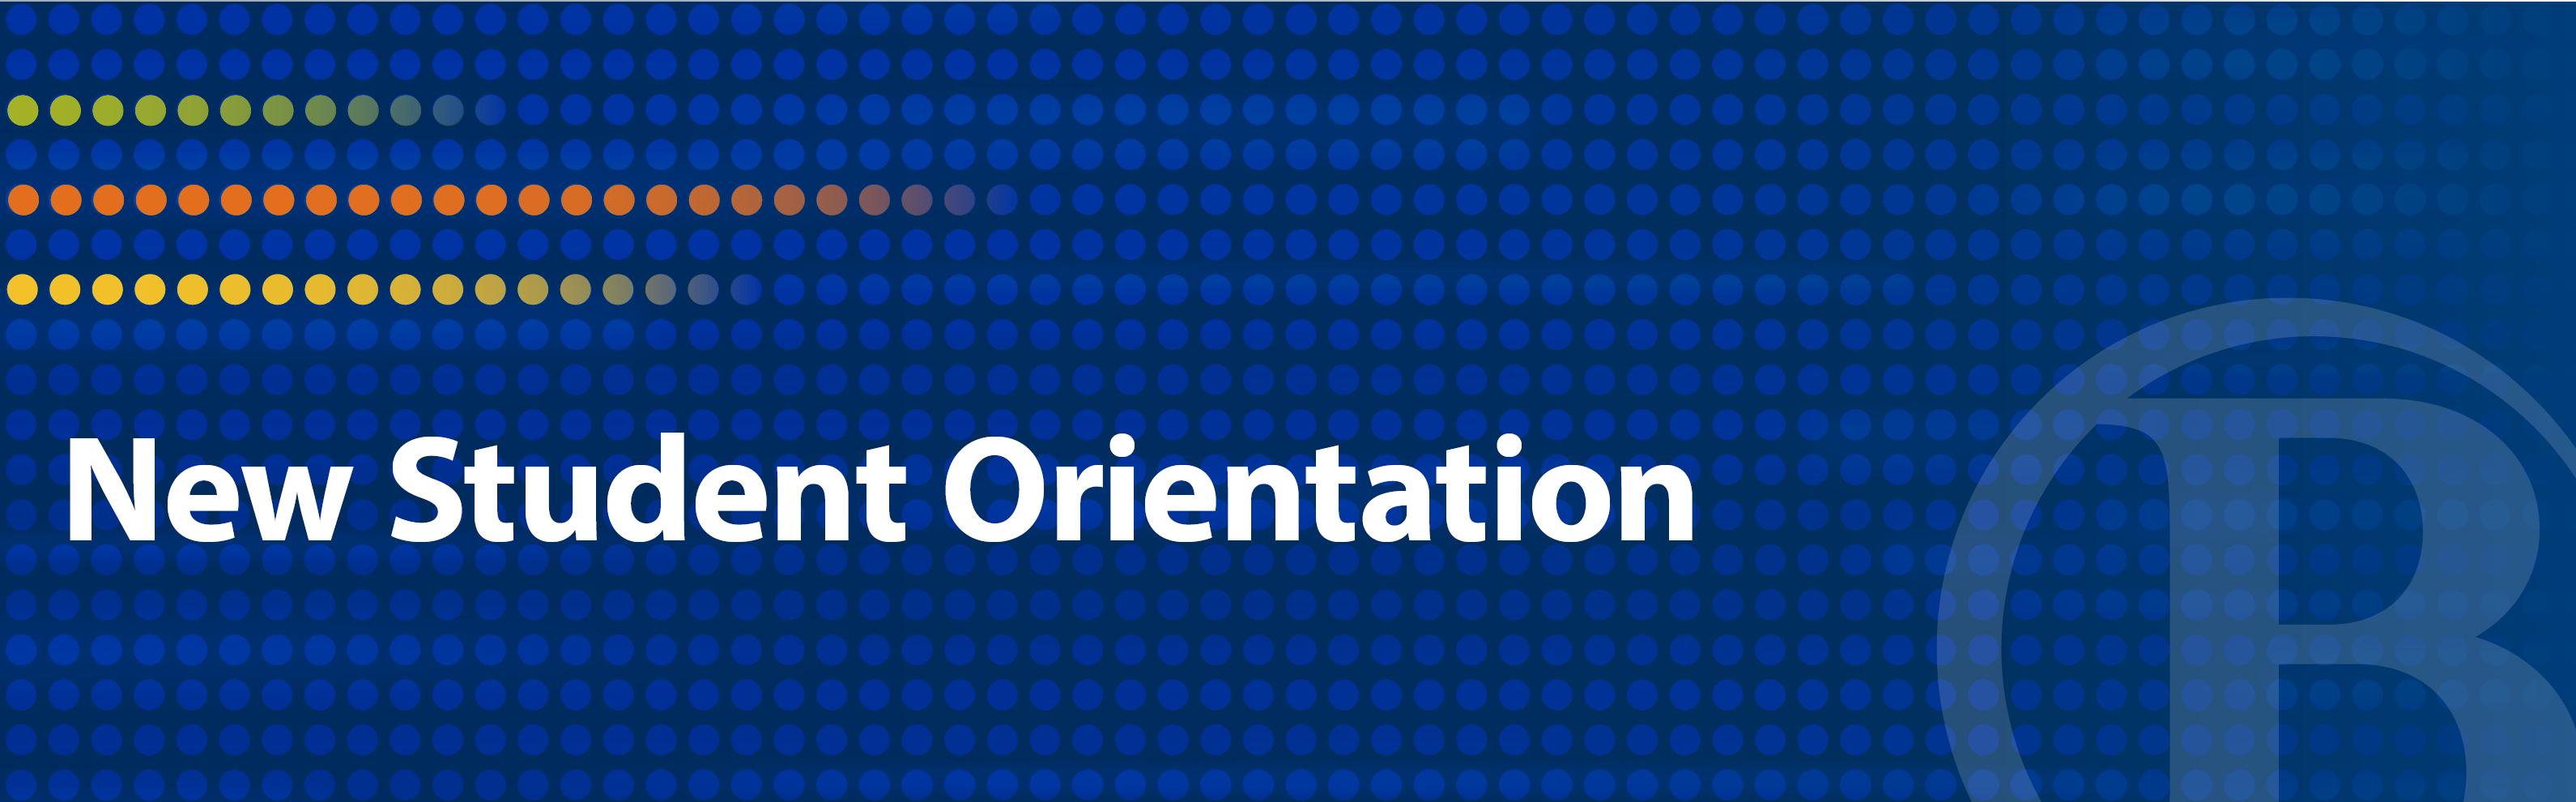 New Student Orientation at Bellevue College